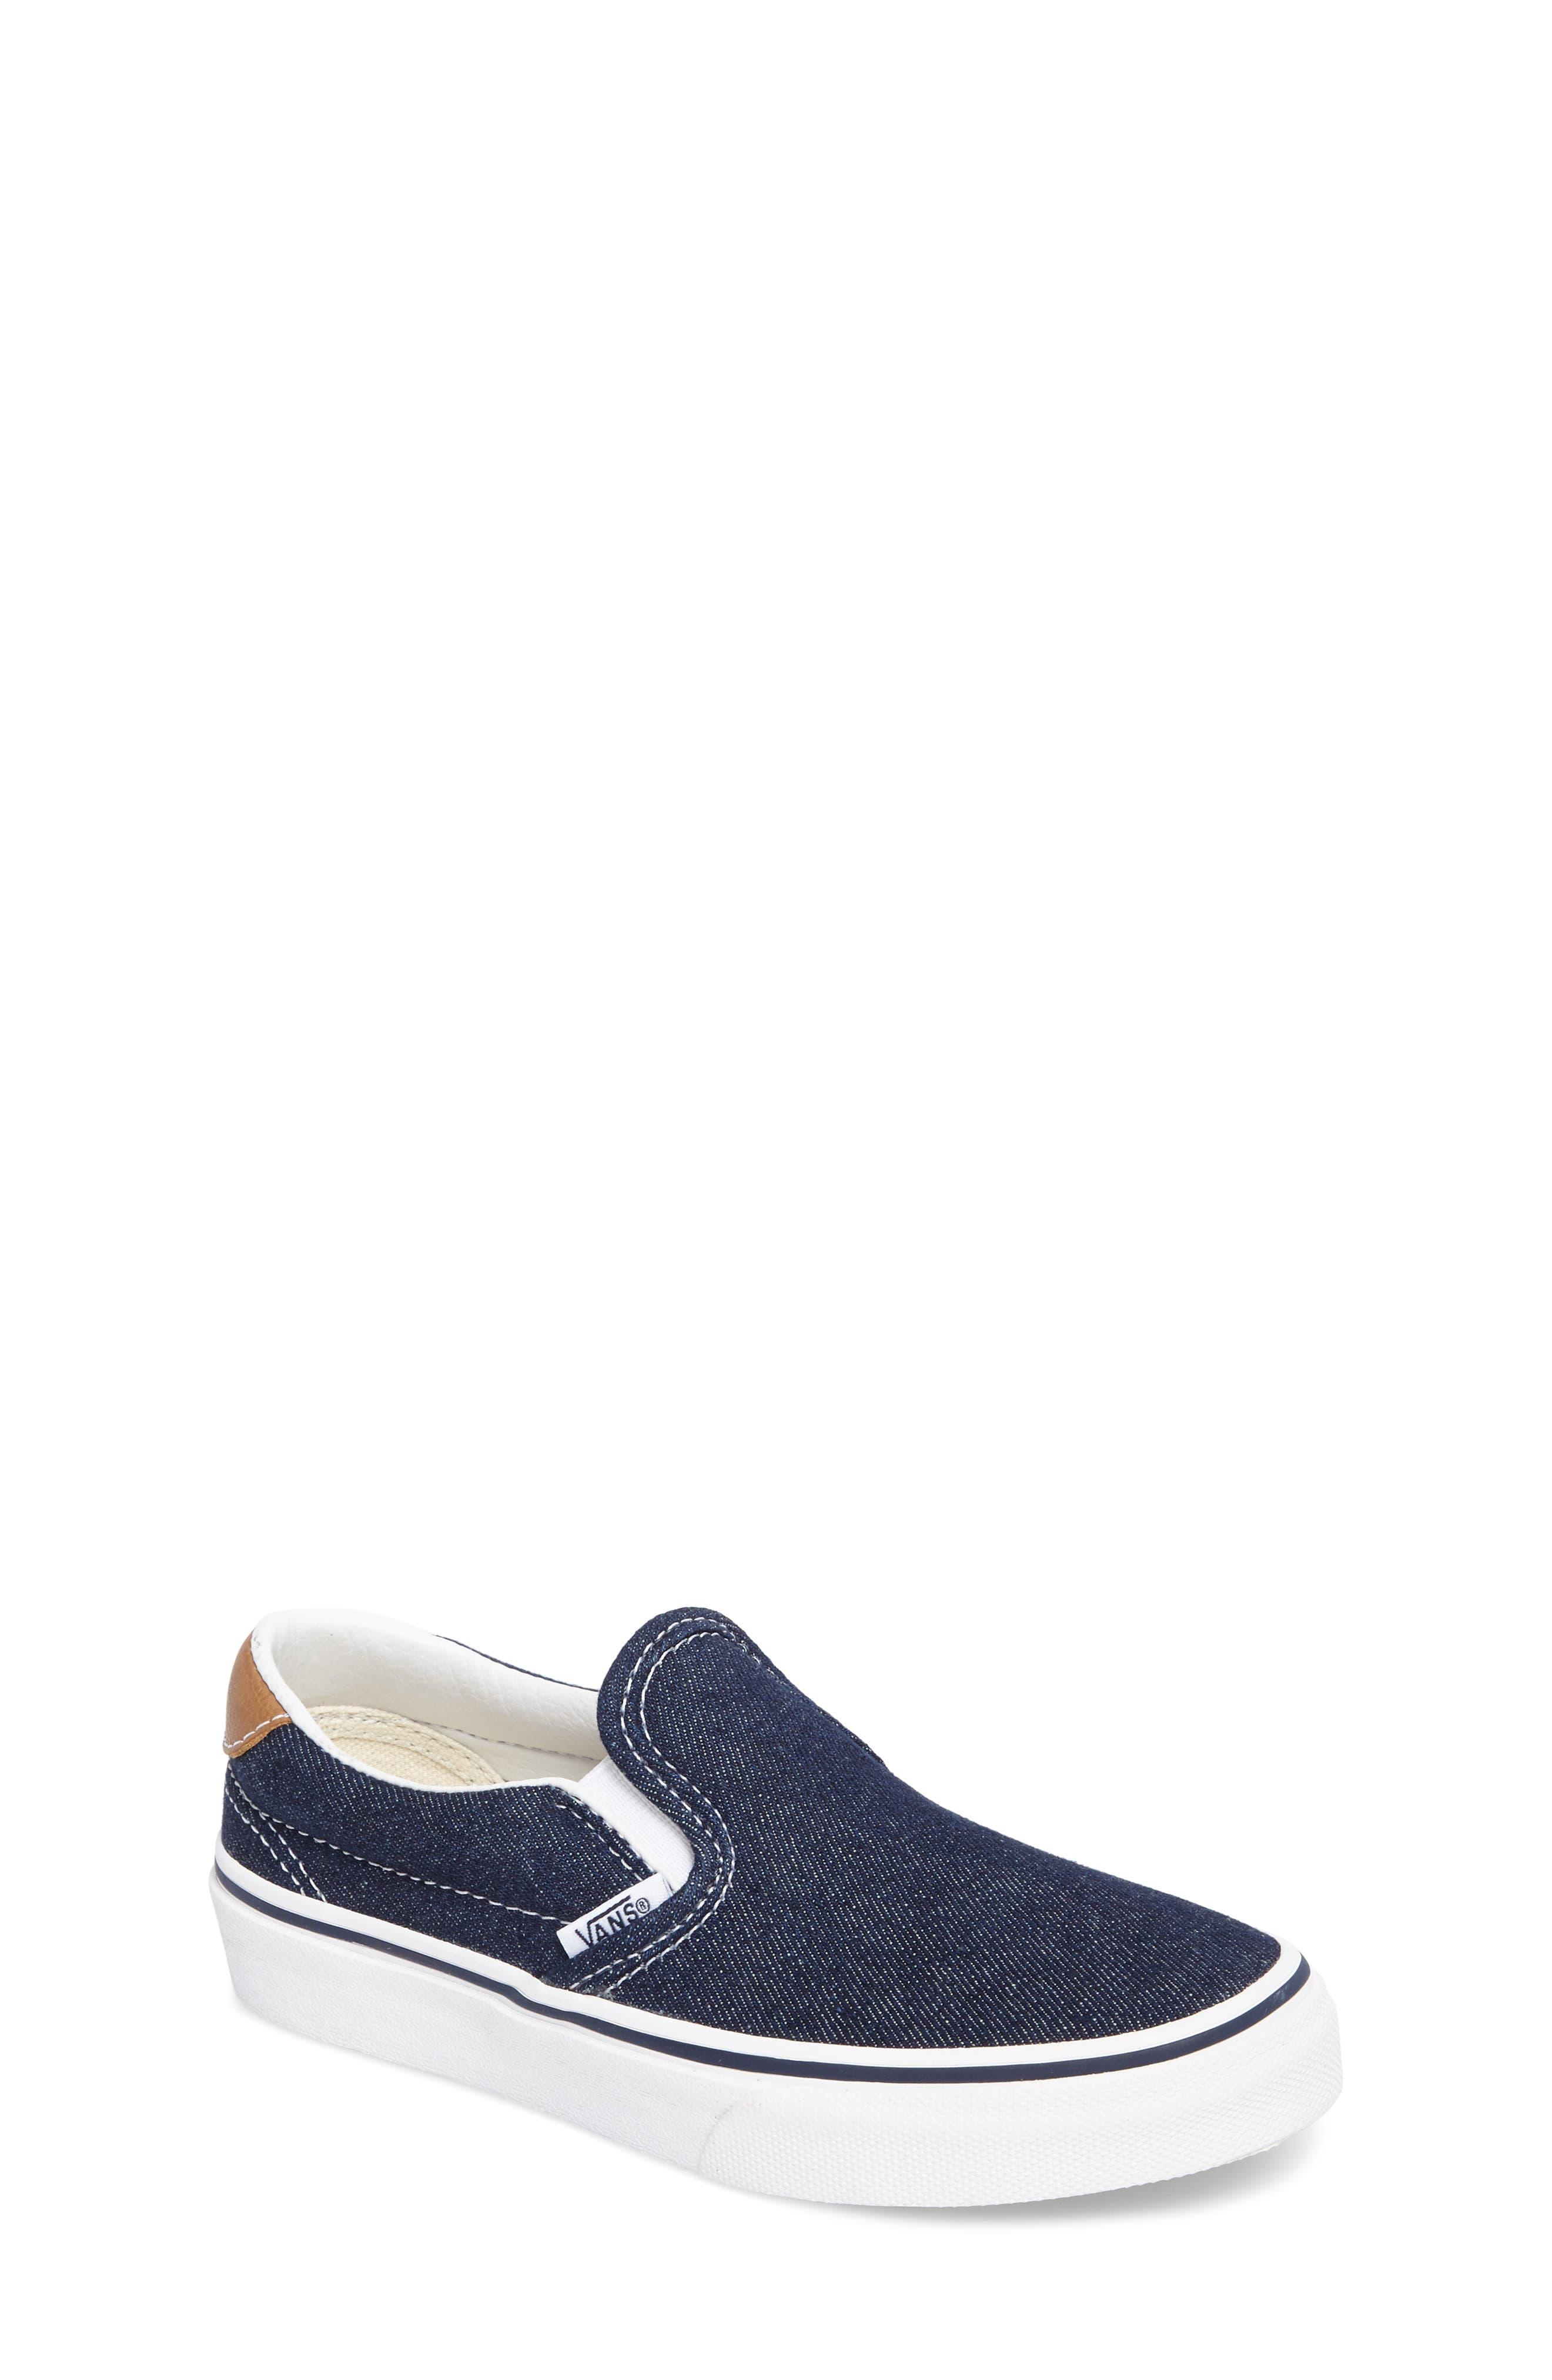 Denim C&L Slip-On 59 Sneaker,                             Main thumbnail 1, color,                             420